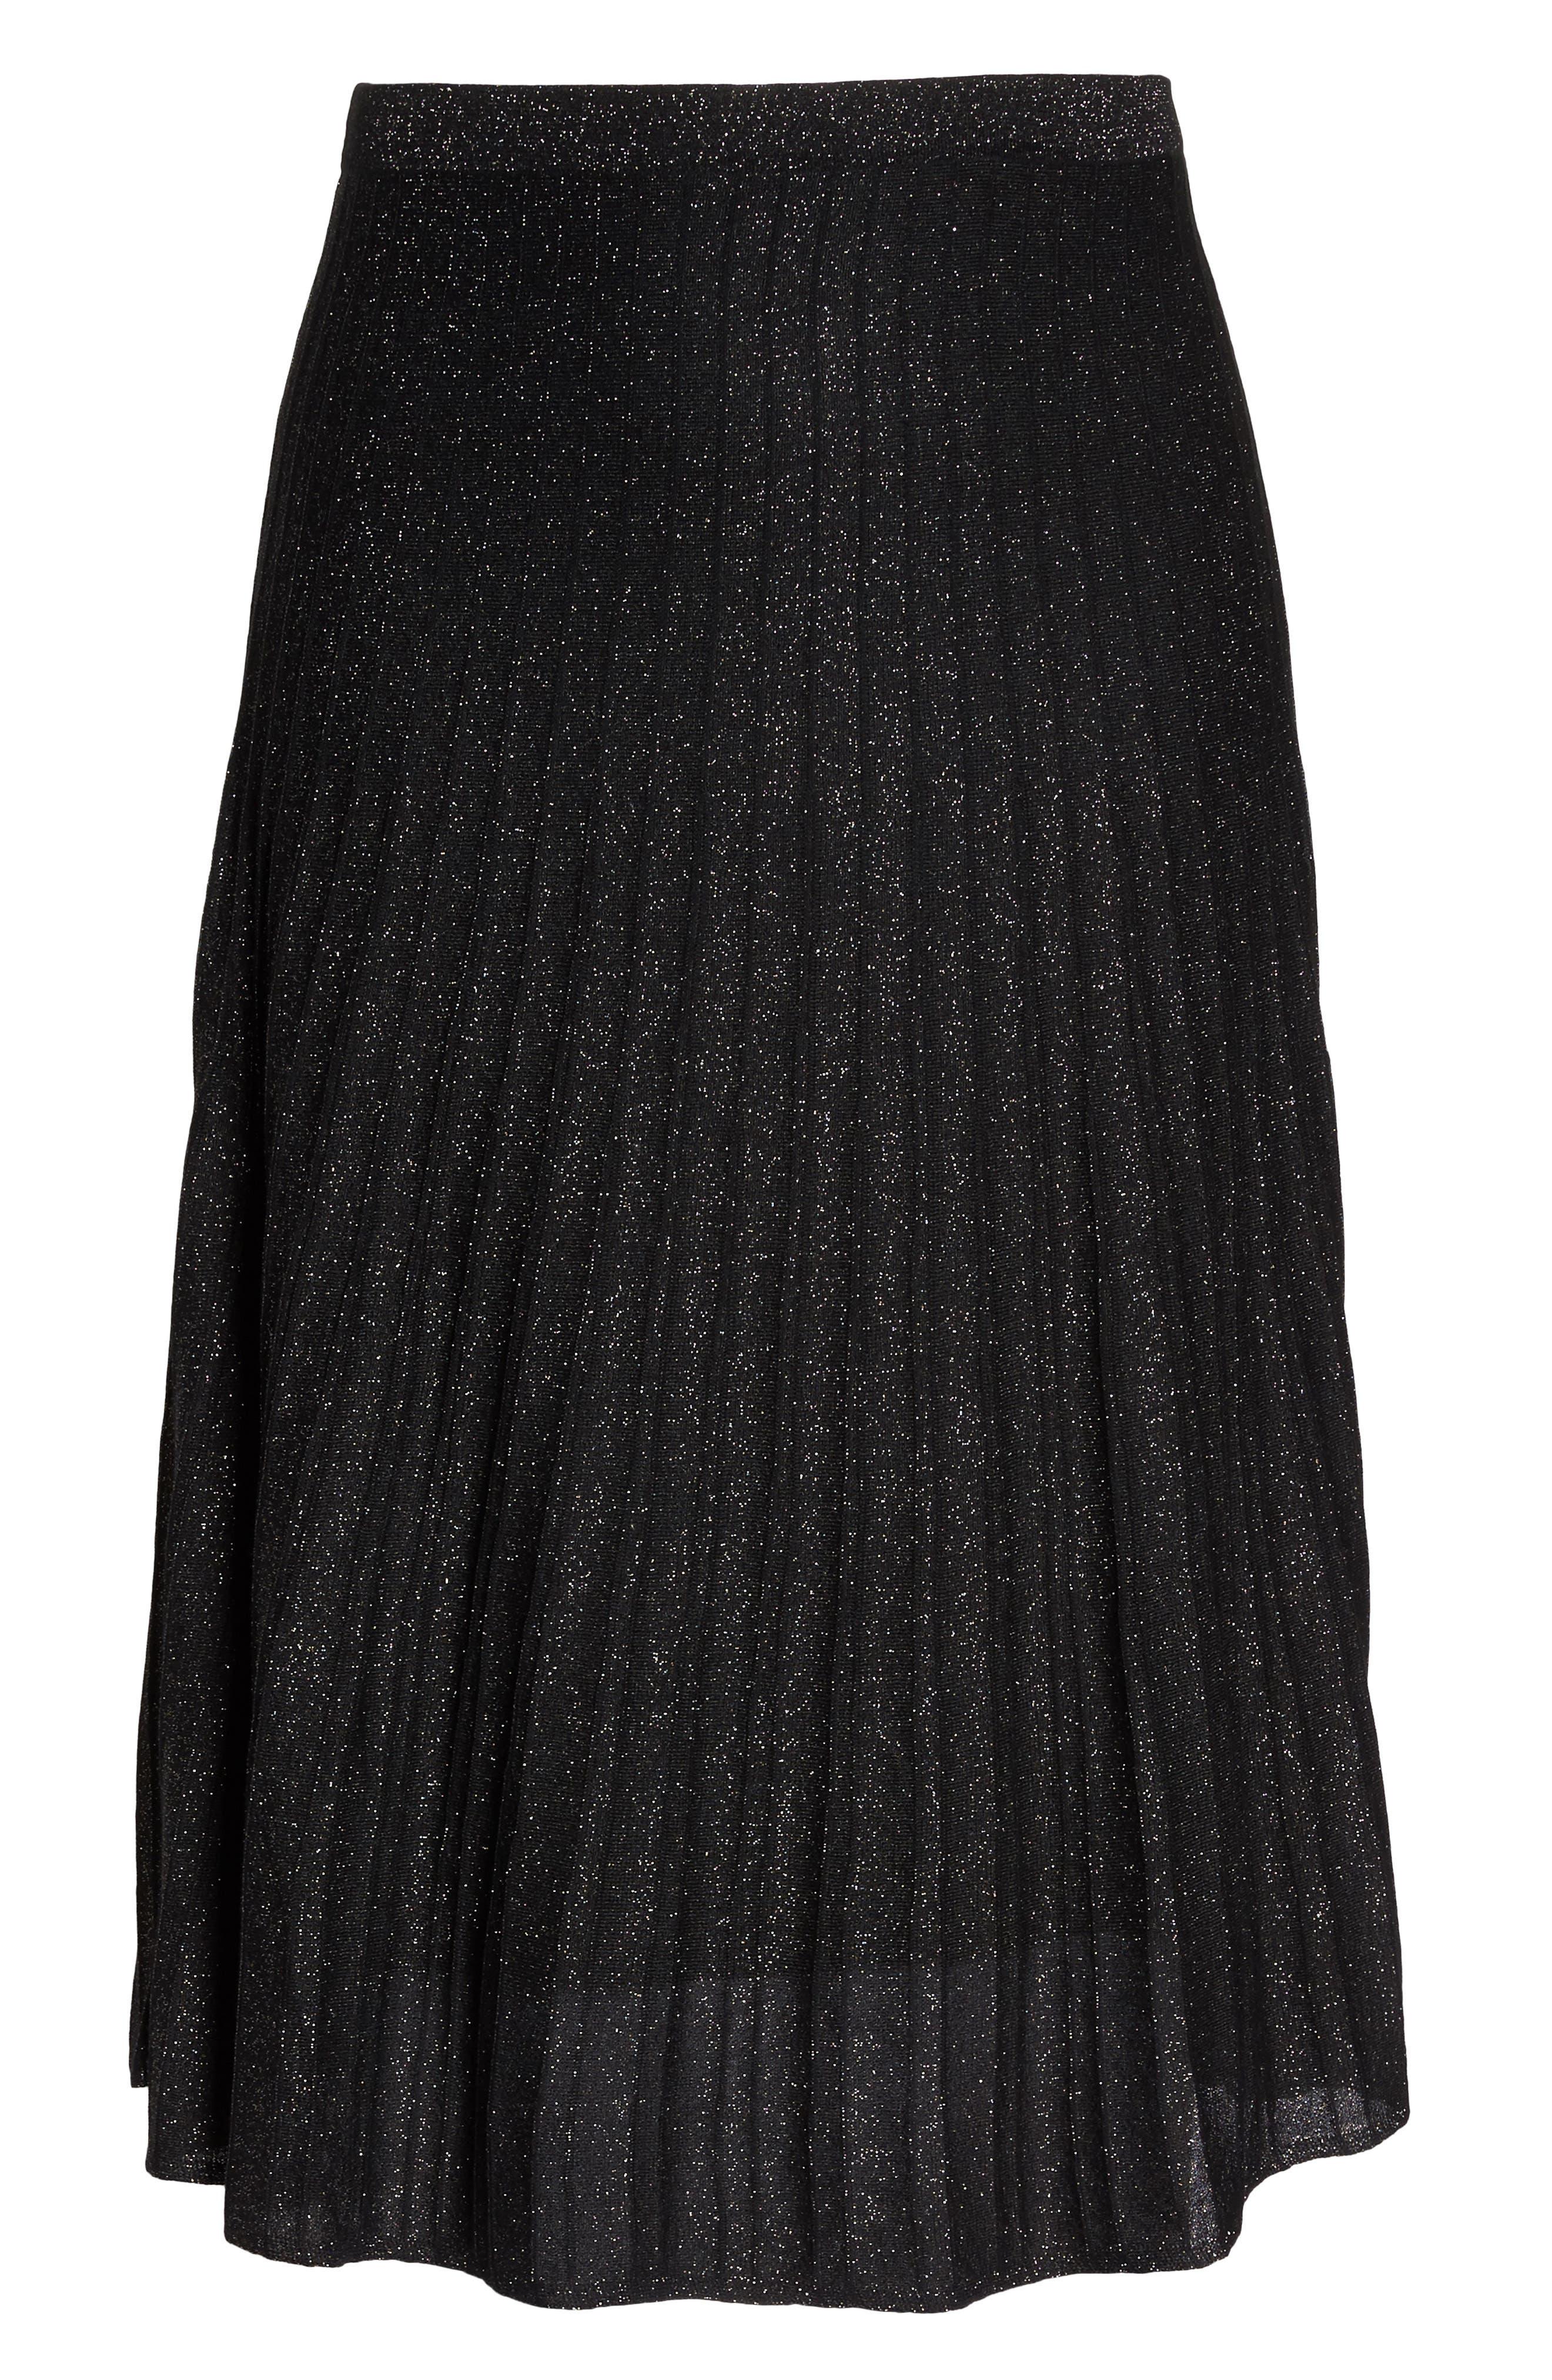 Luminary Skirt,                             Alternate thumbnail 6, color,                             Black Mix